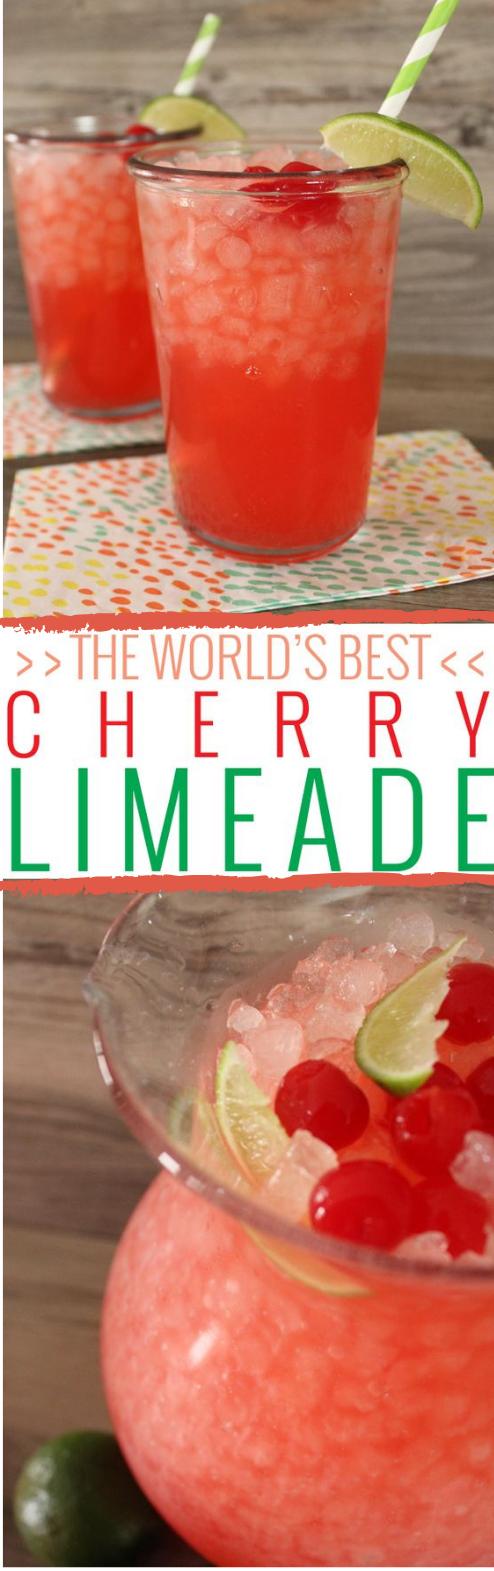 THE WORLD'S BEST CHERRY LIMEADE